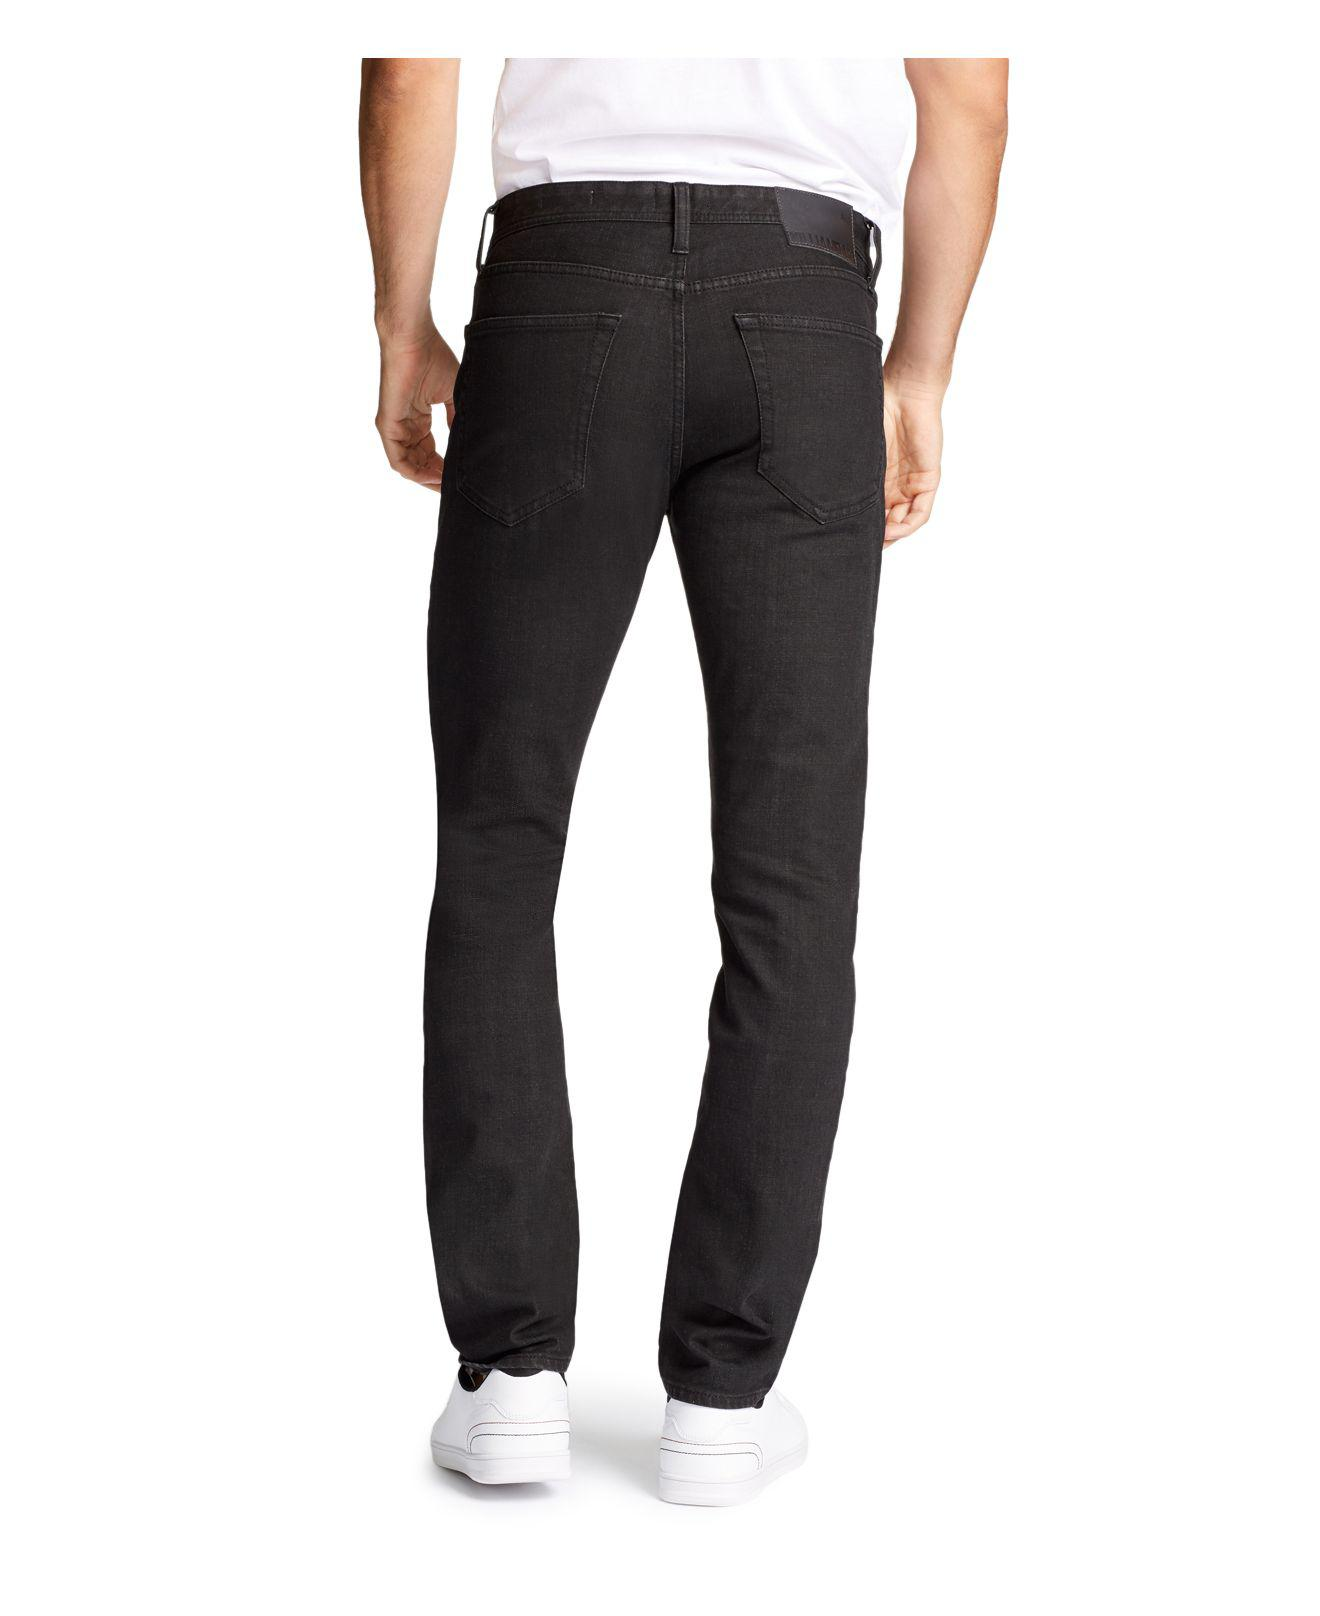 William Rast Denim Hollywood Slim Fit Jeans in Onyx (Black) for Men